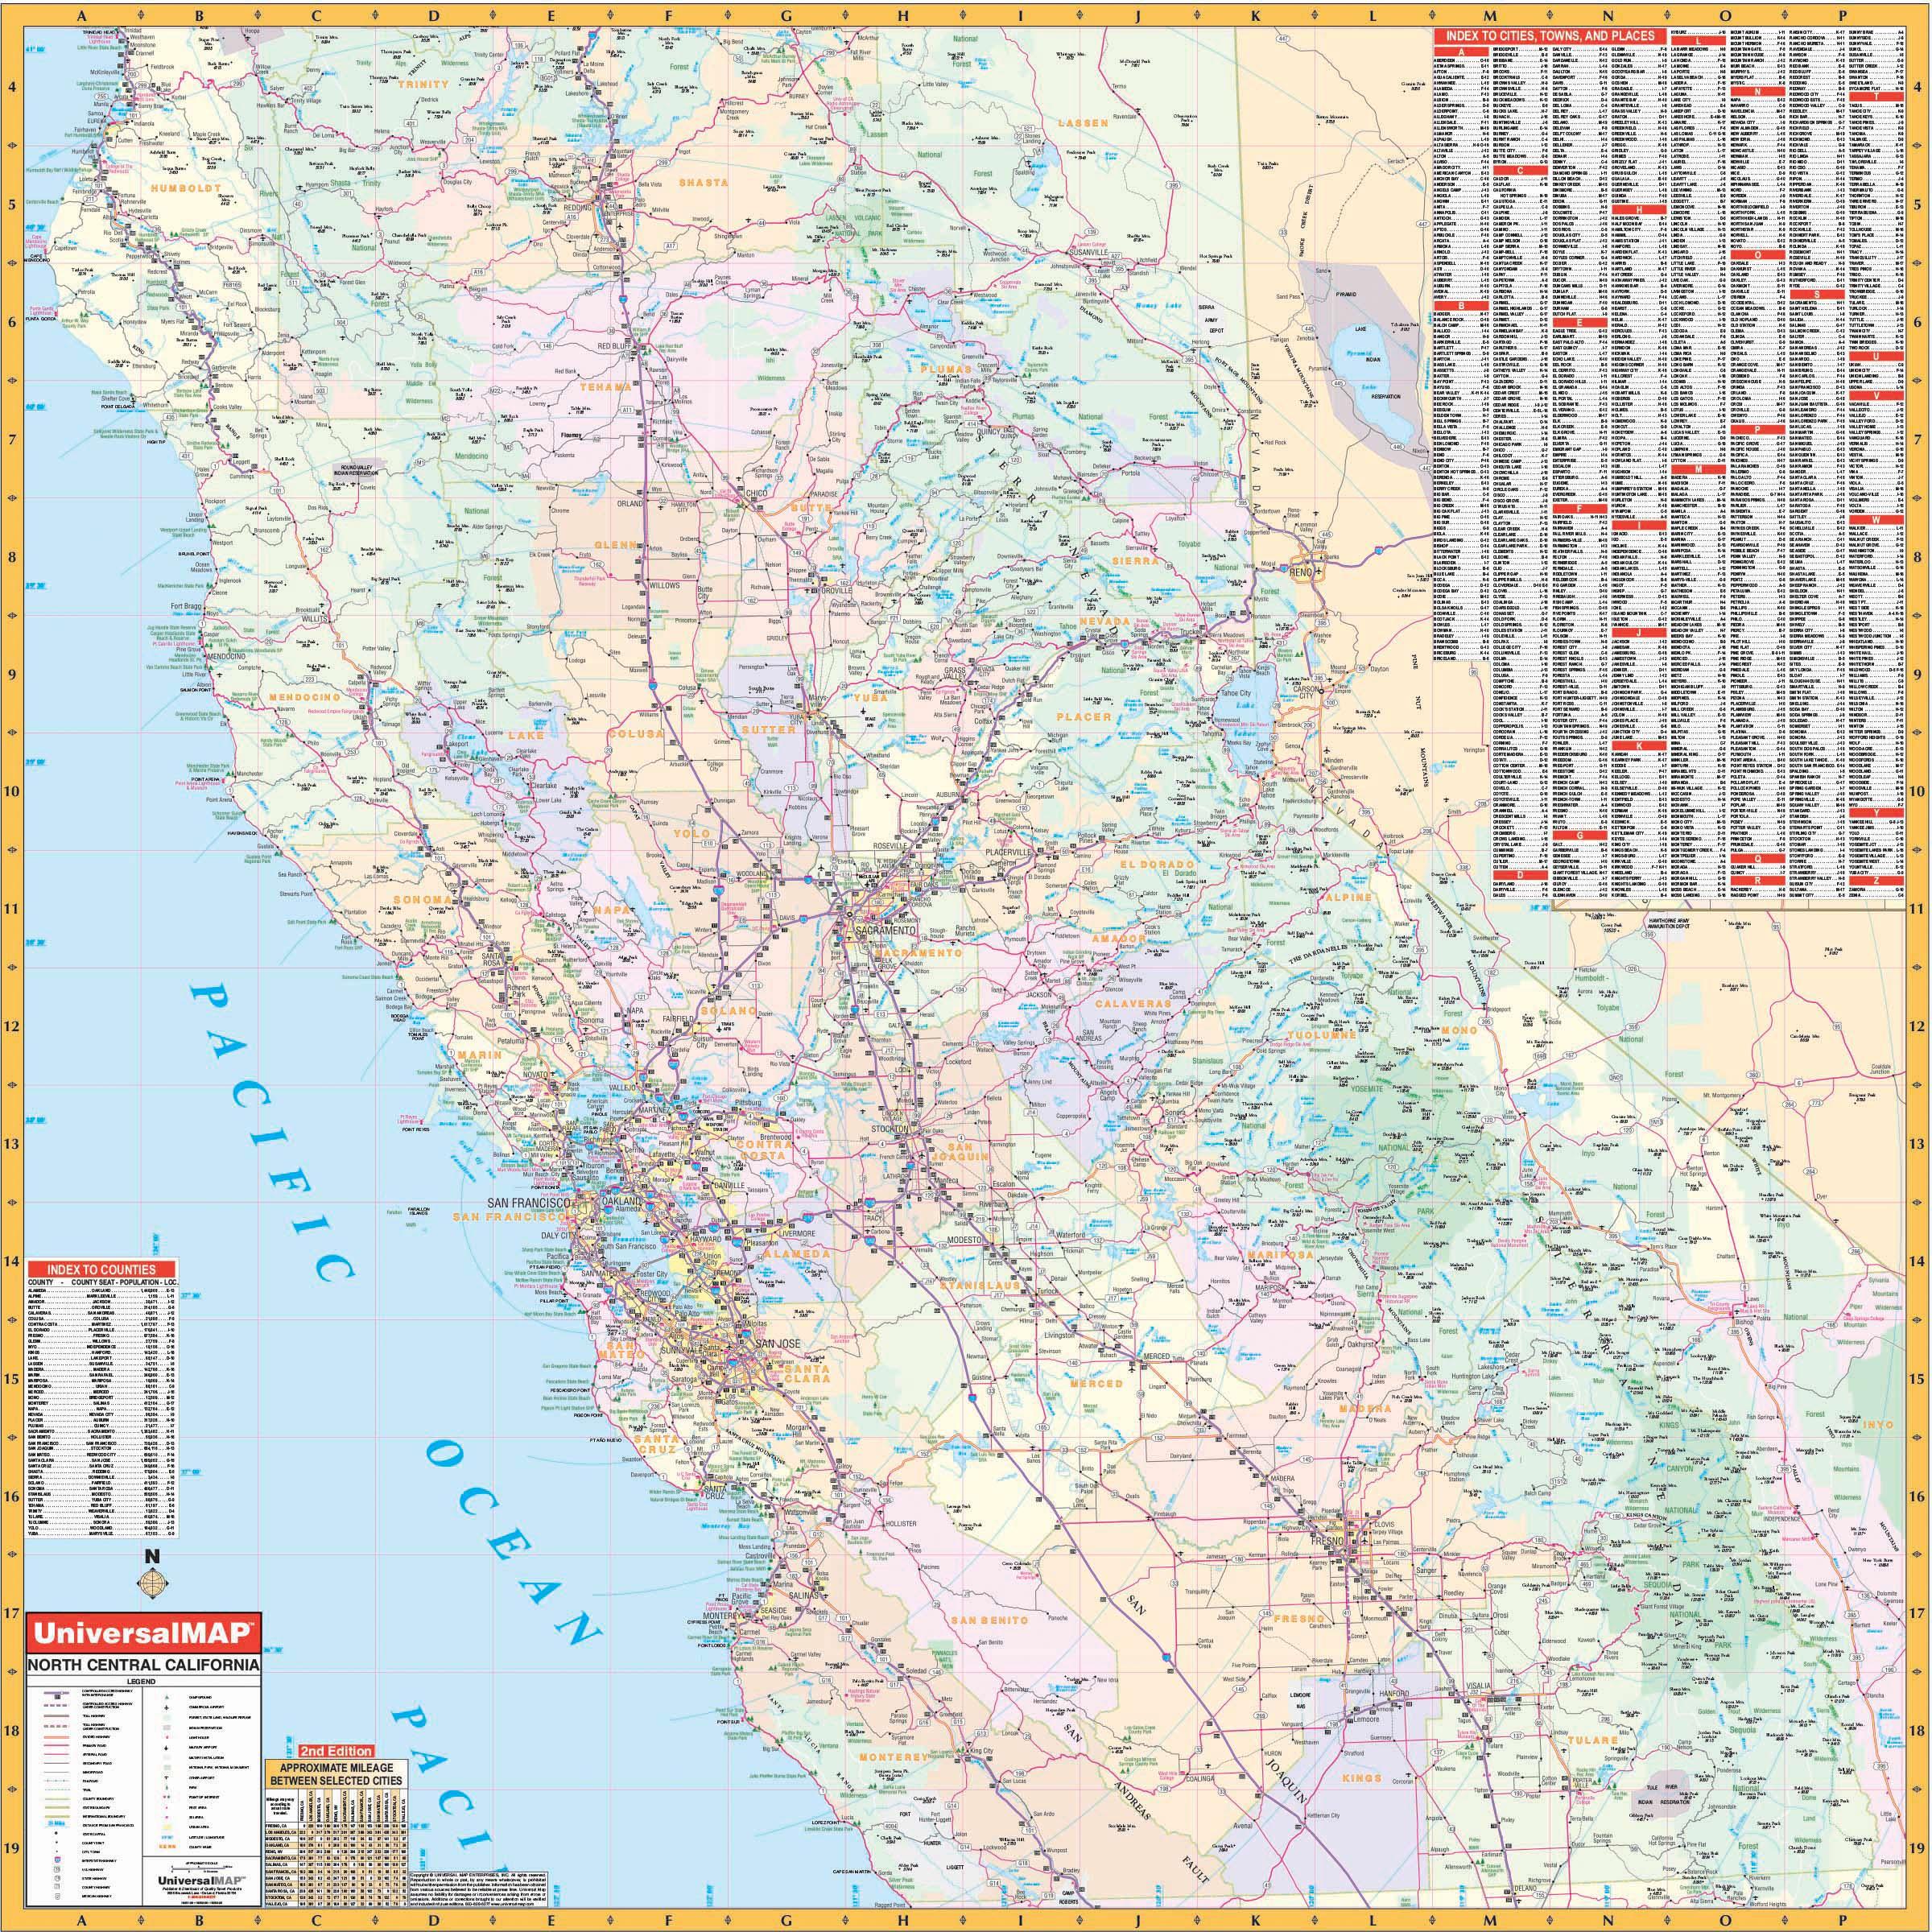 California State North Central Wall Map – Kappa Map Group - California Wall Map